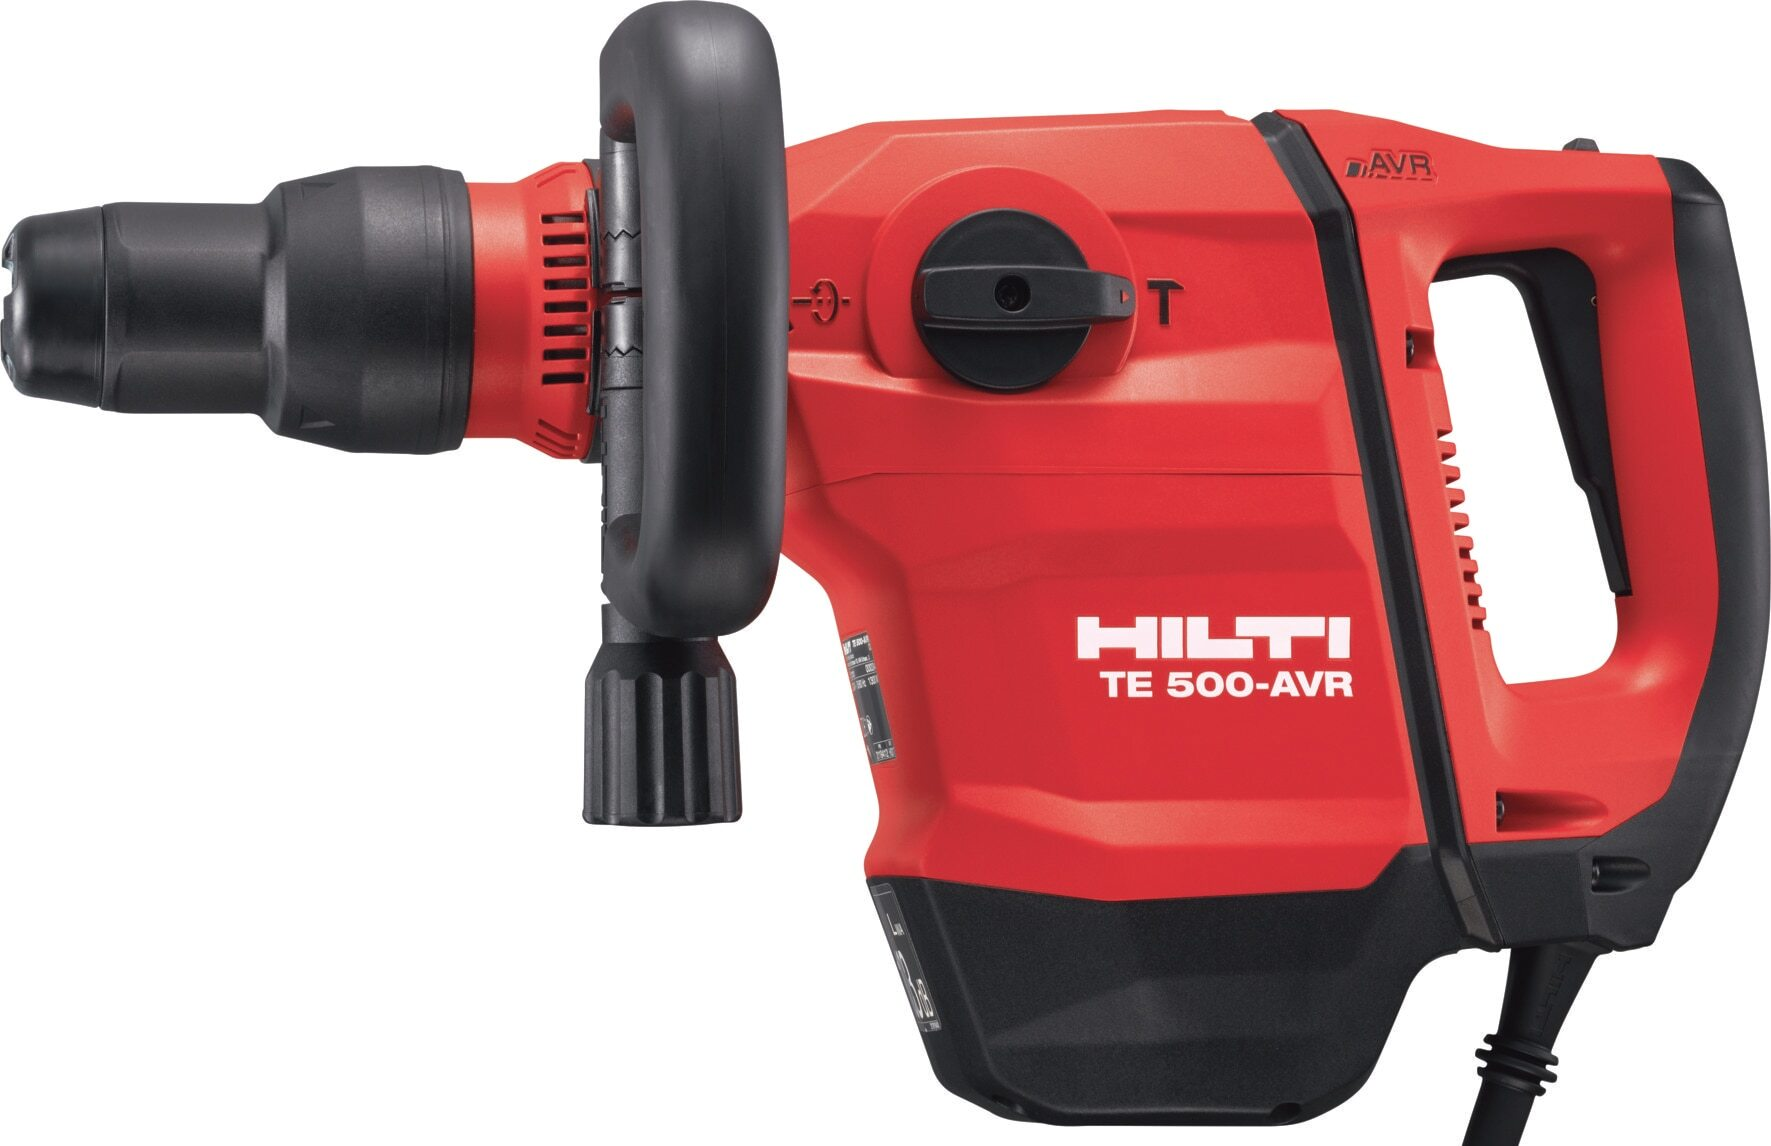 Hilti TE 500-AVR Wall Breaker SDS Max 110v 6.3Kg